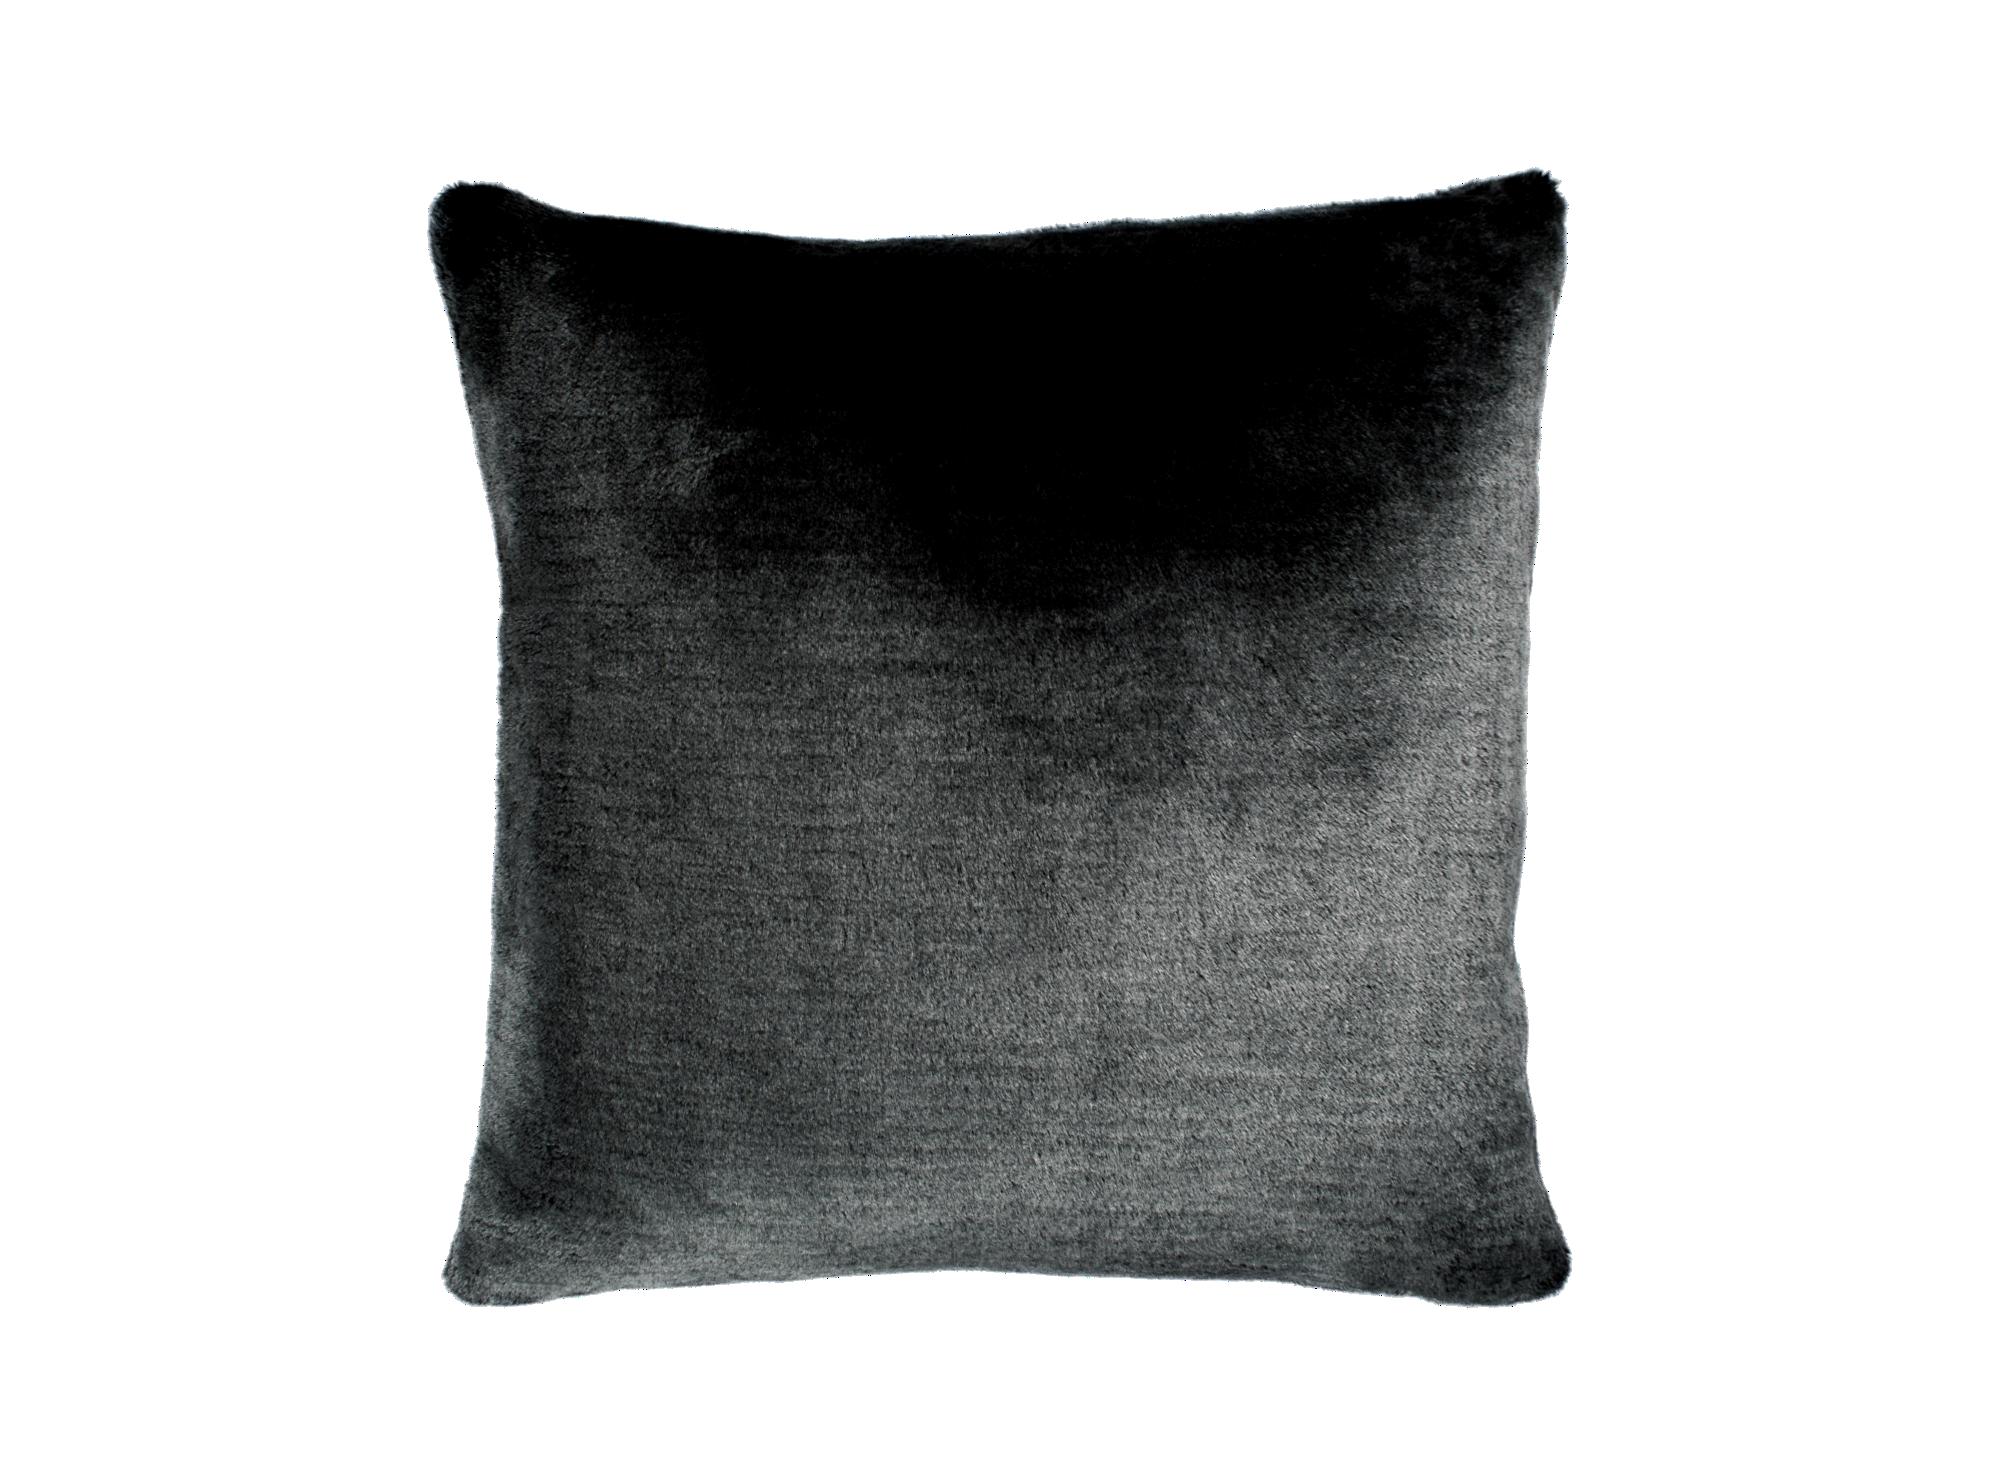 Coussin 60x60 housse 100% polyester coussin revetu 100% polypropylene ...